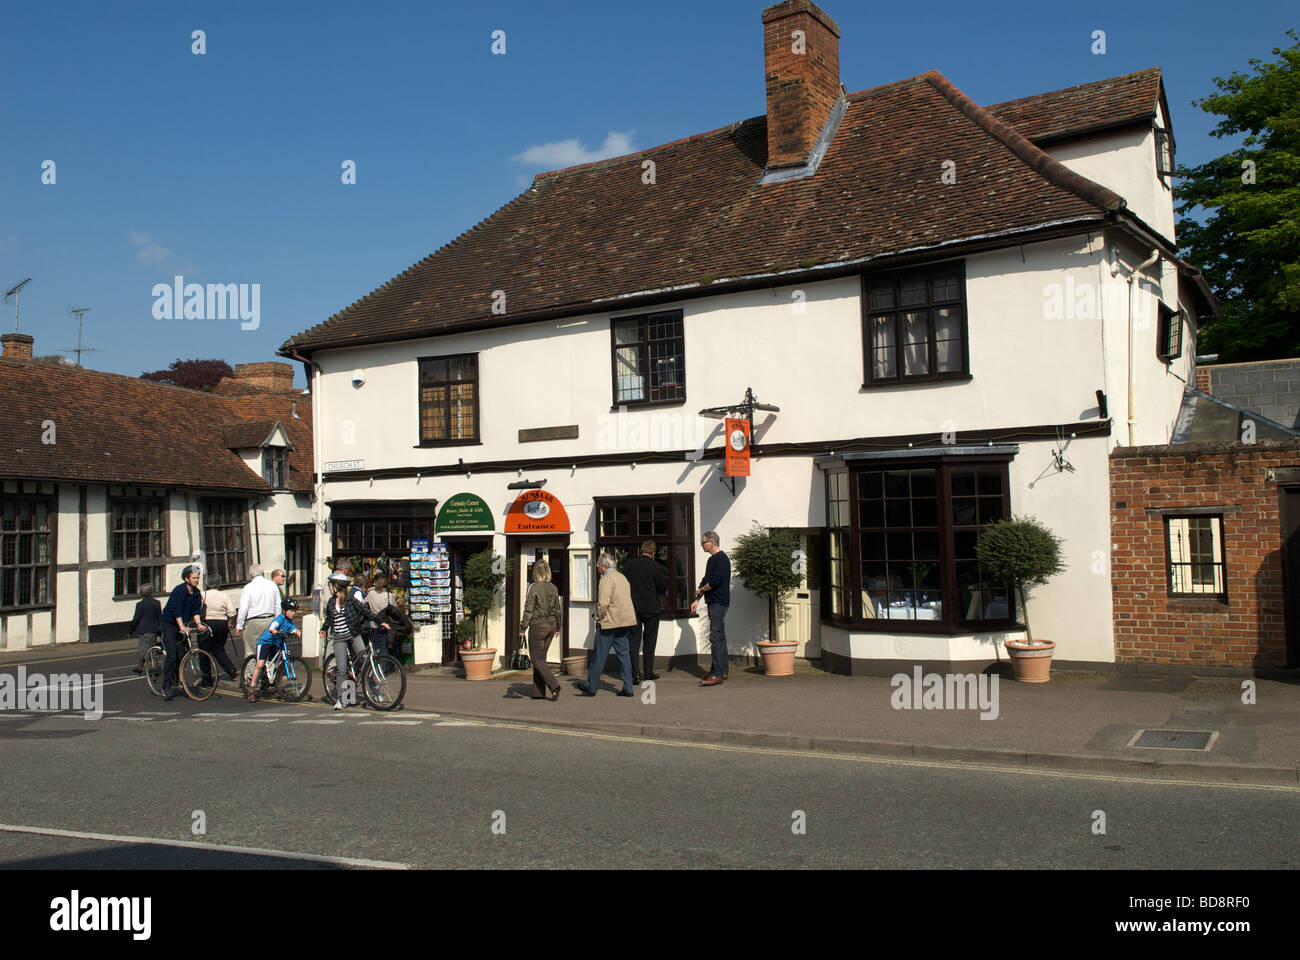 Local shop, Lavenham, Suffolk, UK. - Stock Image